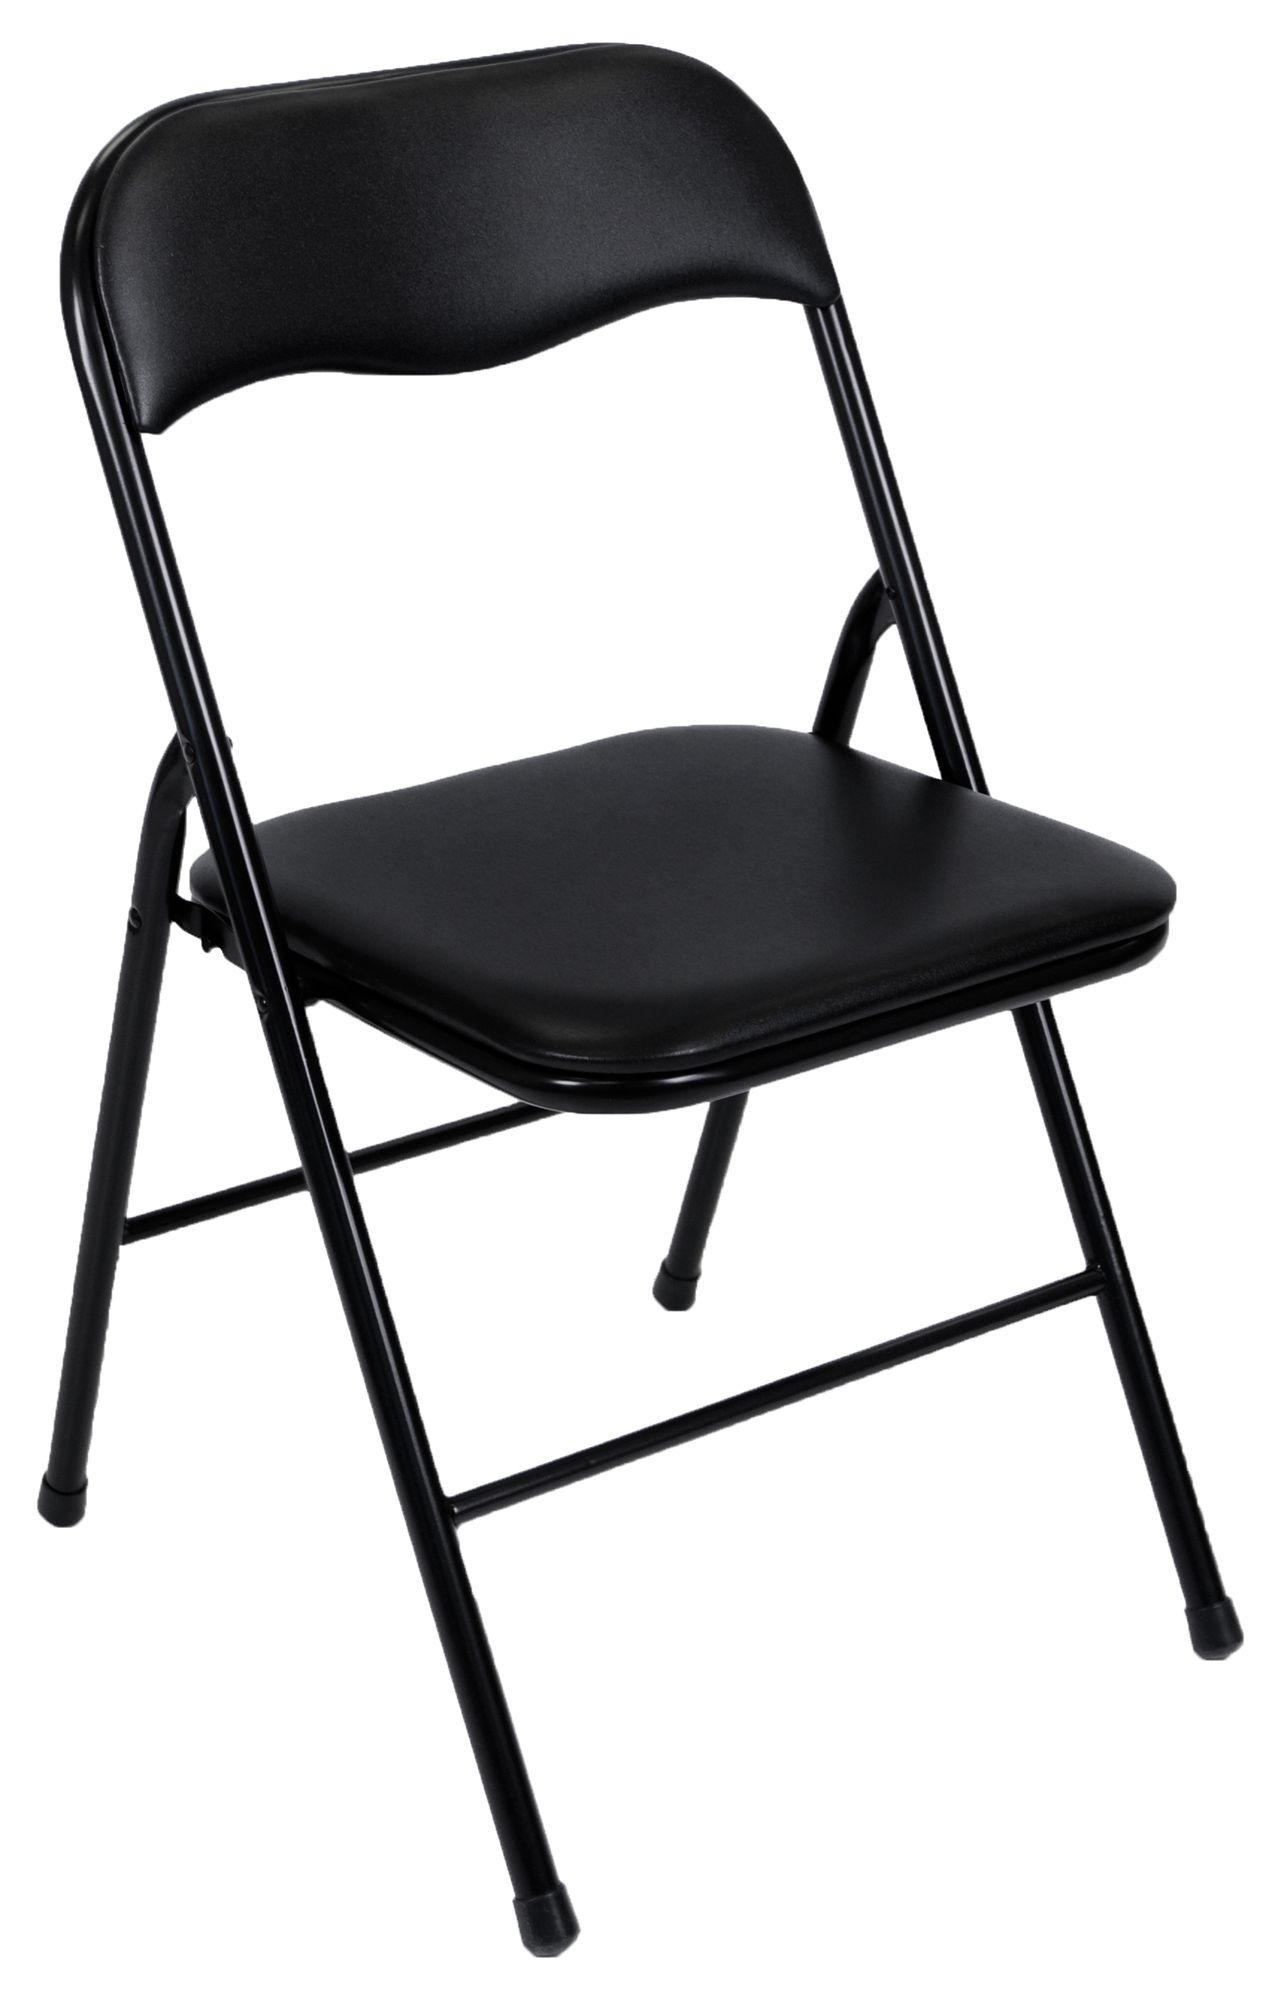 Folding Chairs Black Black Folding Chair Kitchen Dining Room